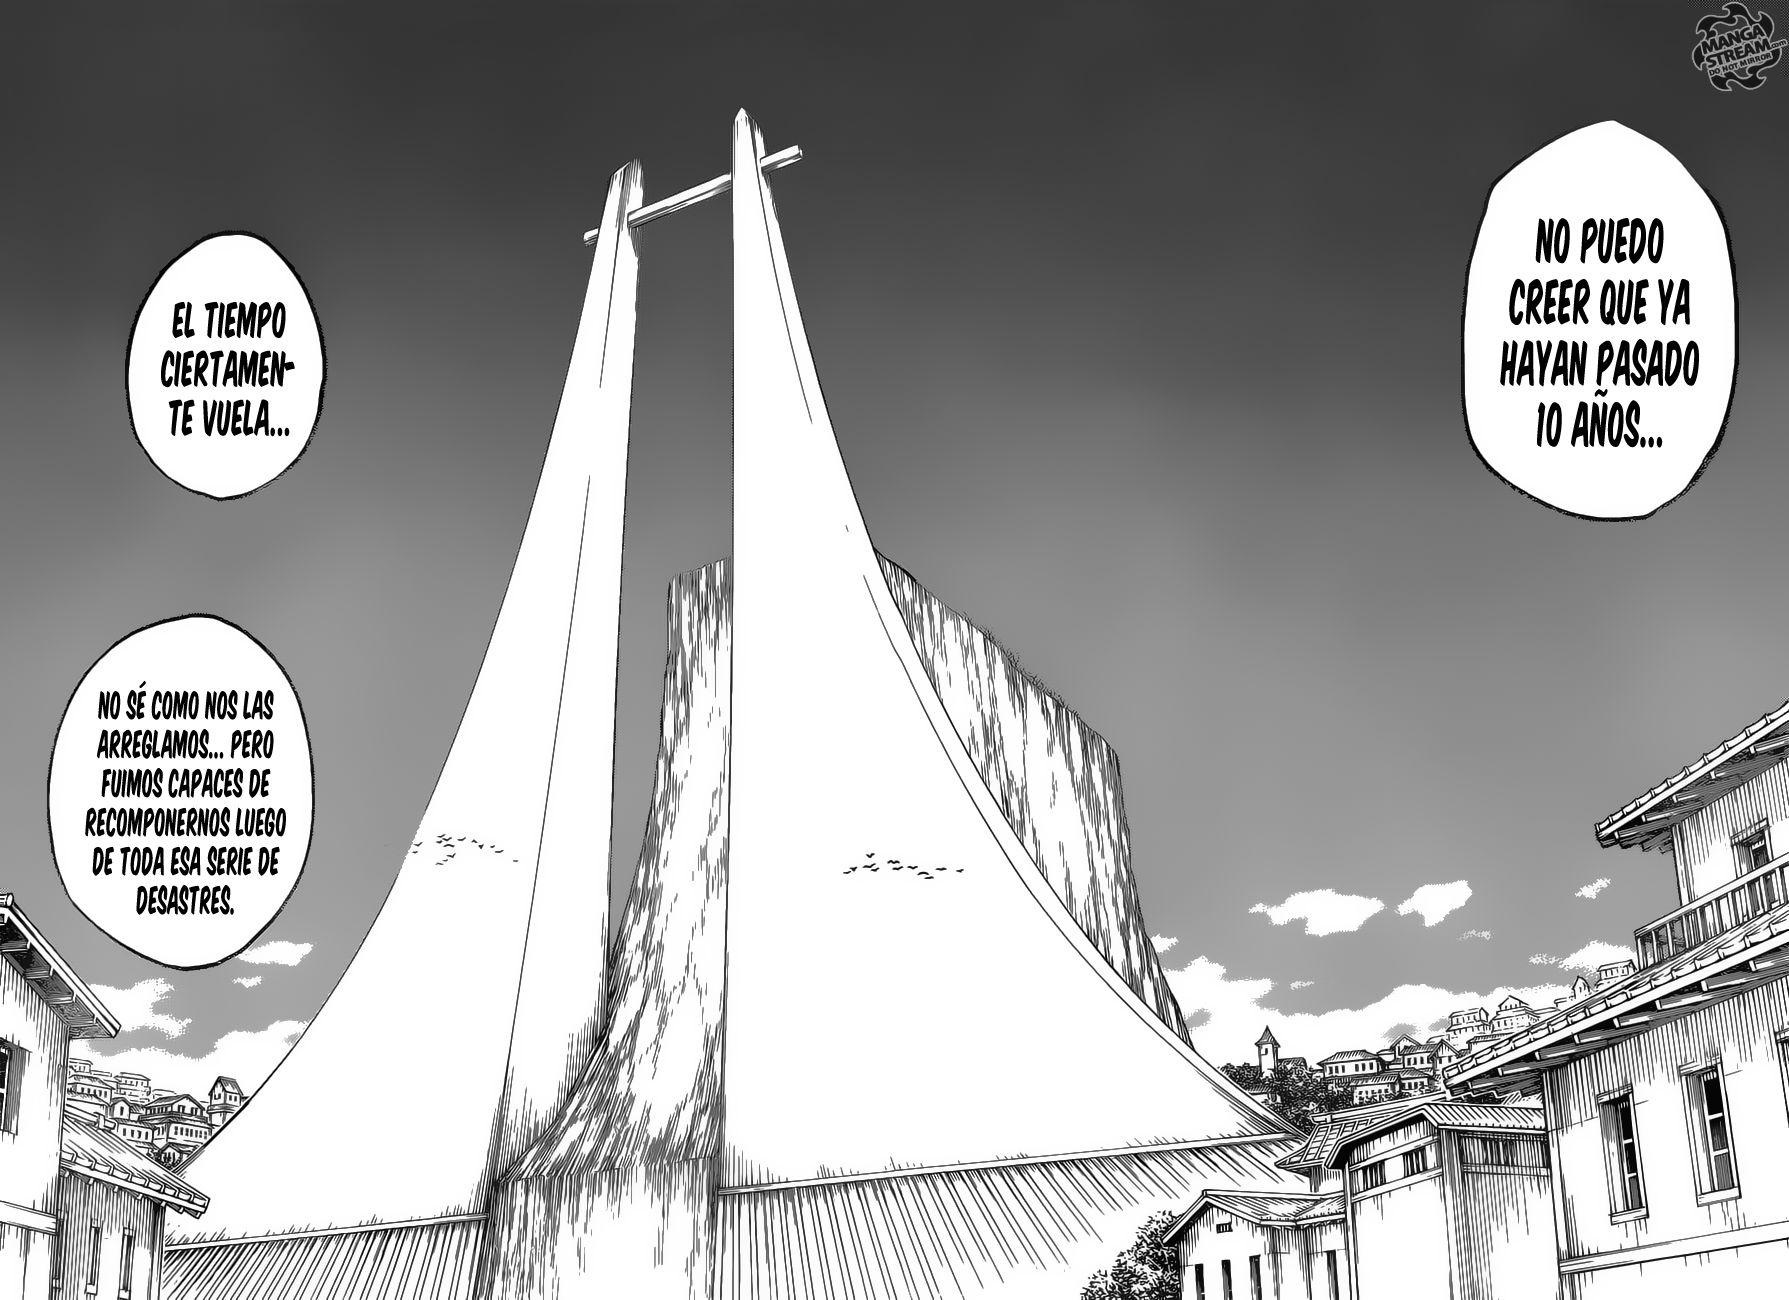 http://c5.ninemanga.com/es_manga/63/63/487784/53bf5a0b368da3a8281571caca60d0c9.jpg Page 5